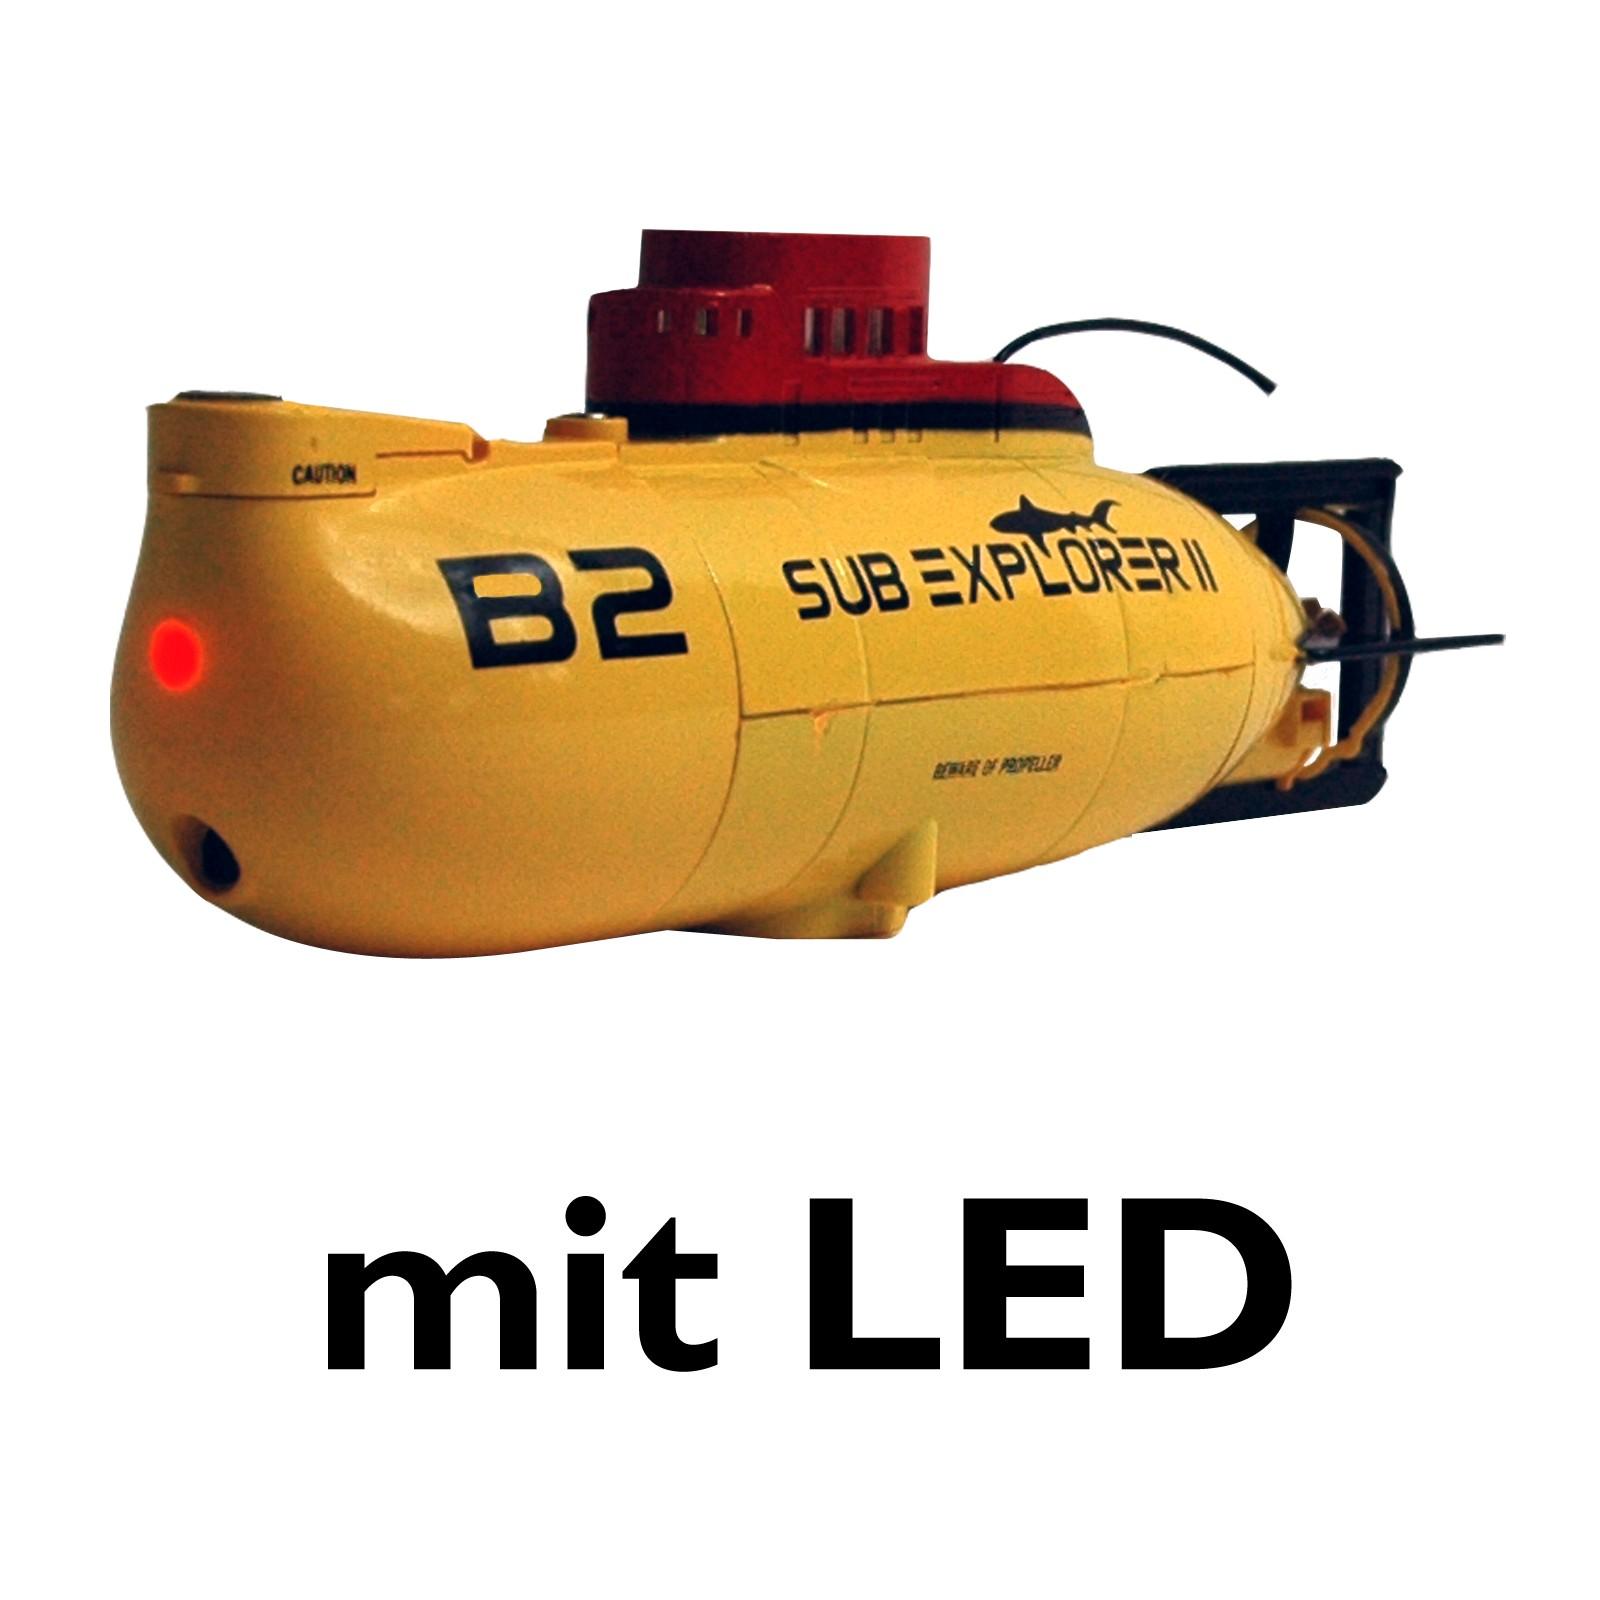 U-Boot ferngesteuert Sub Explorer II mit 3 Motoren 3 Kanal Fernbedienung LED